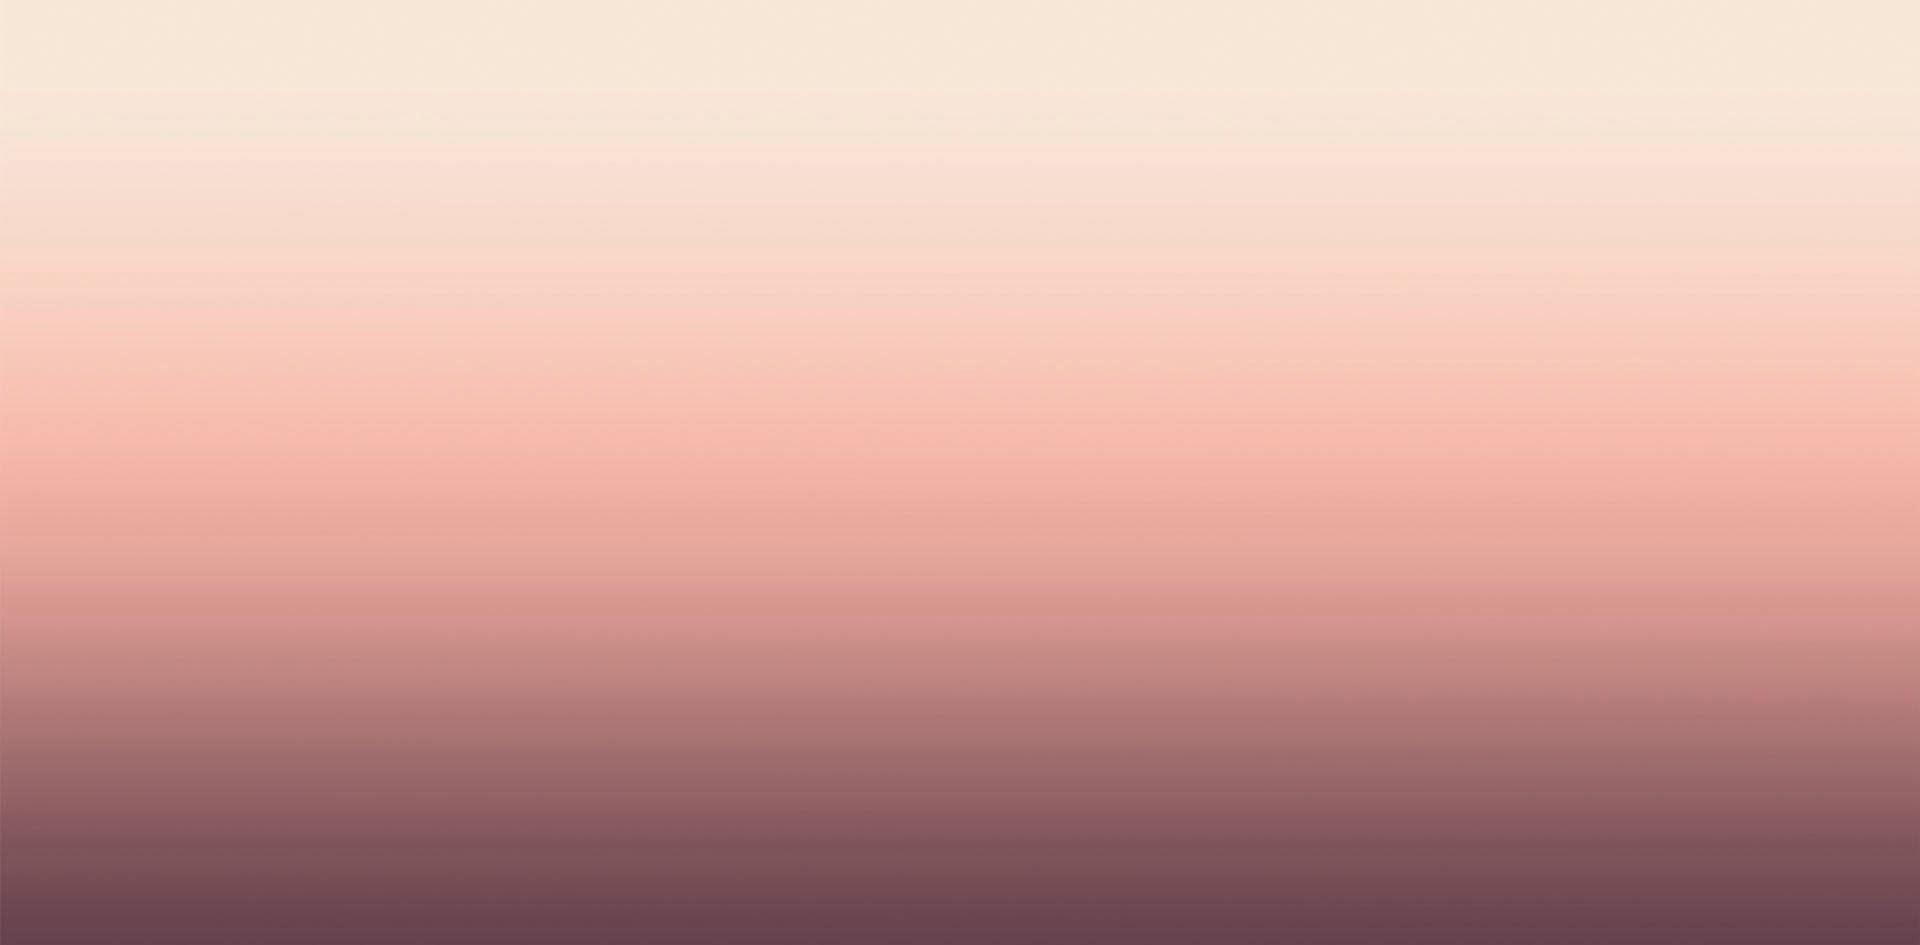 Fototapete Sunset - Ombre, bunt